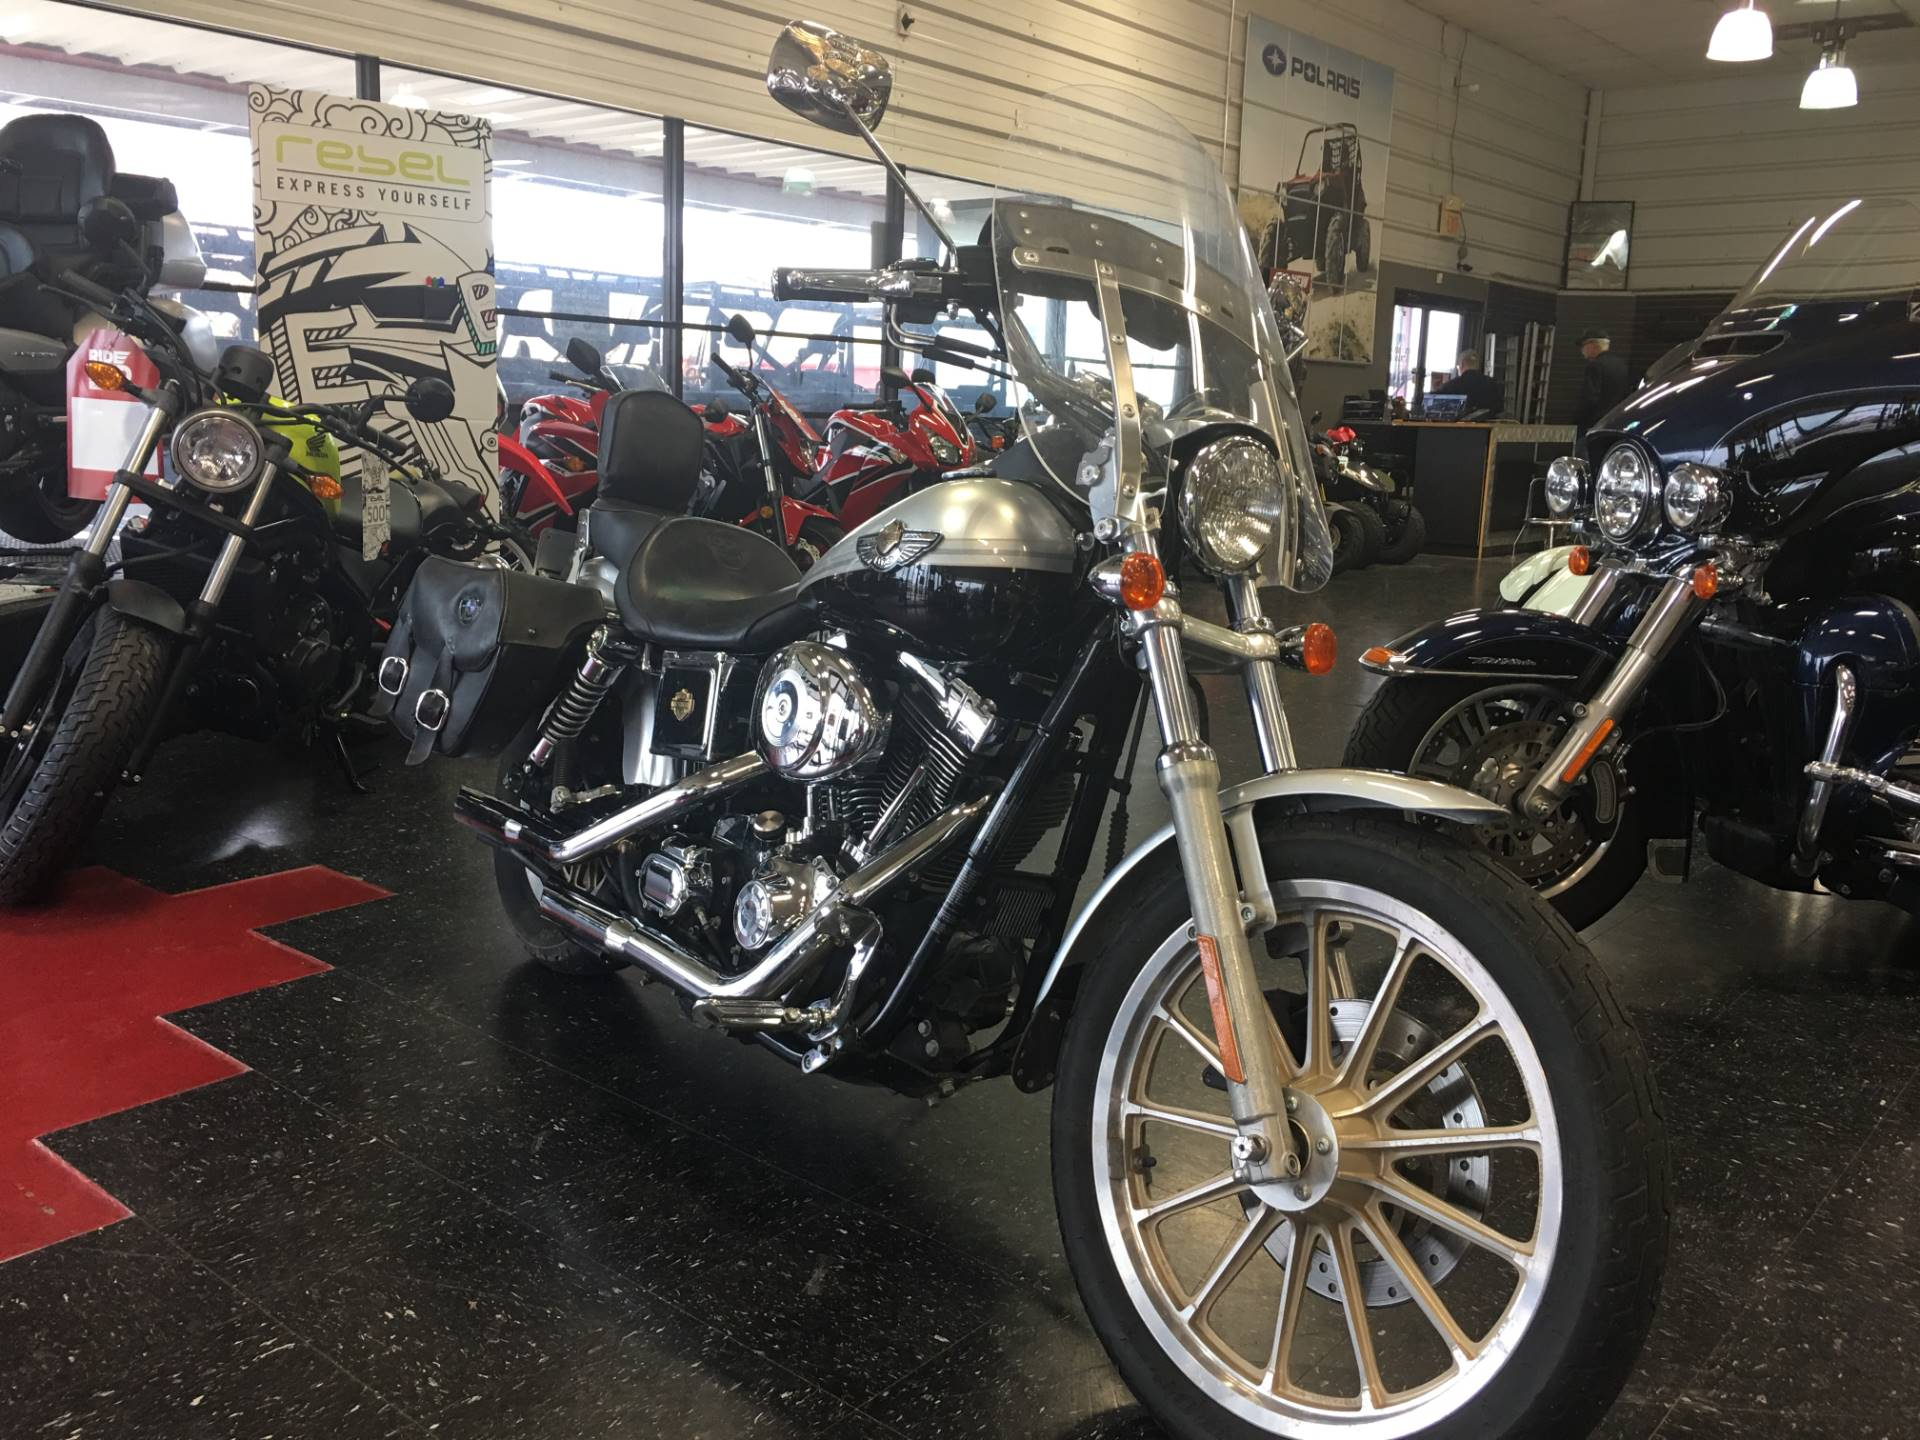 2003 Harley-Davidson FXDL Dyna Low Rider 3